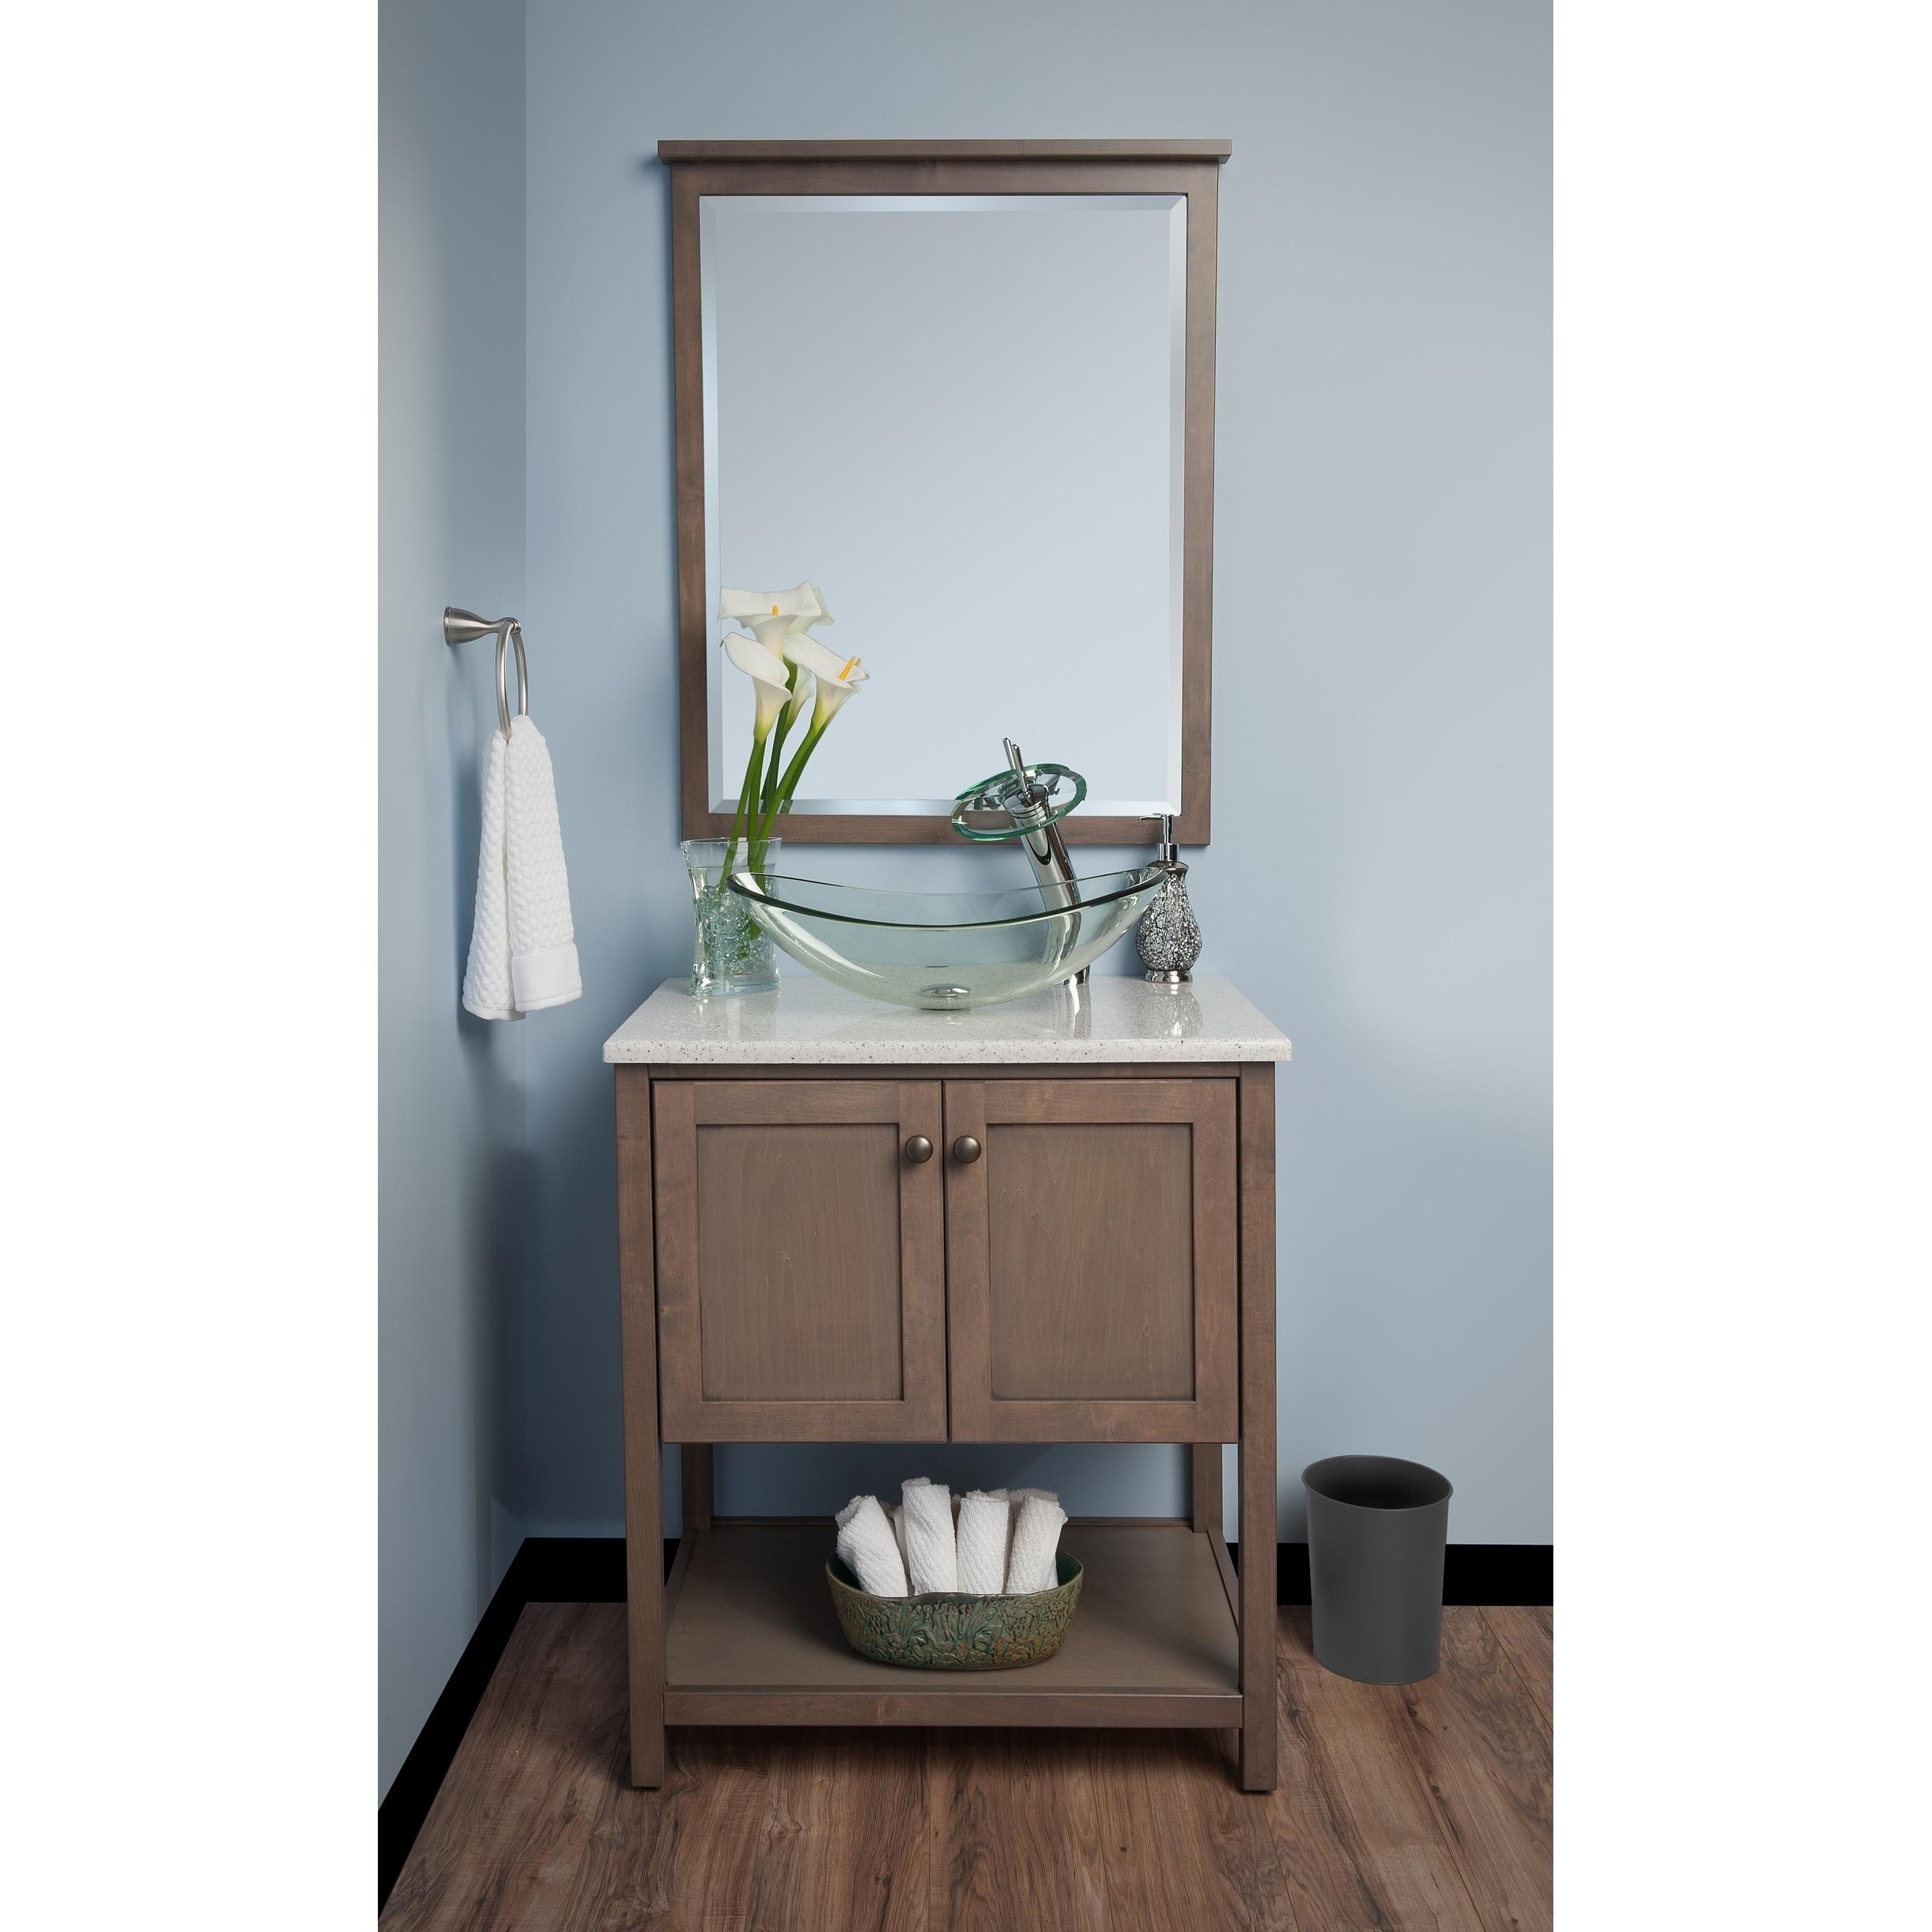 Shop Novatto Chiaro Glass Vessel Bathroom Sink Set, Chrome/ Clear ...